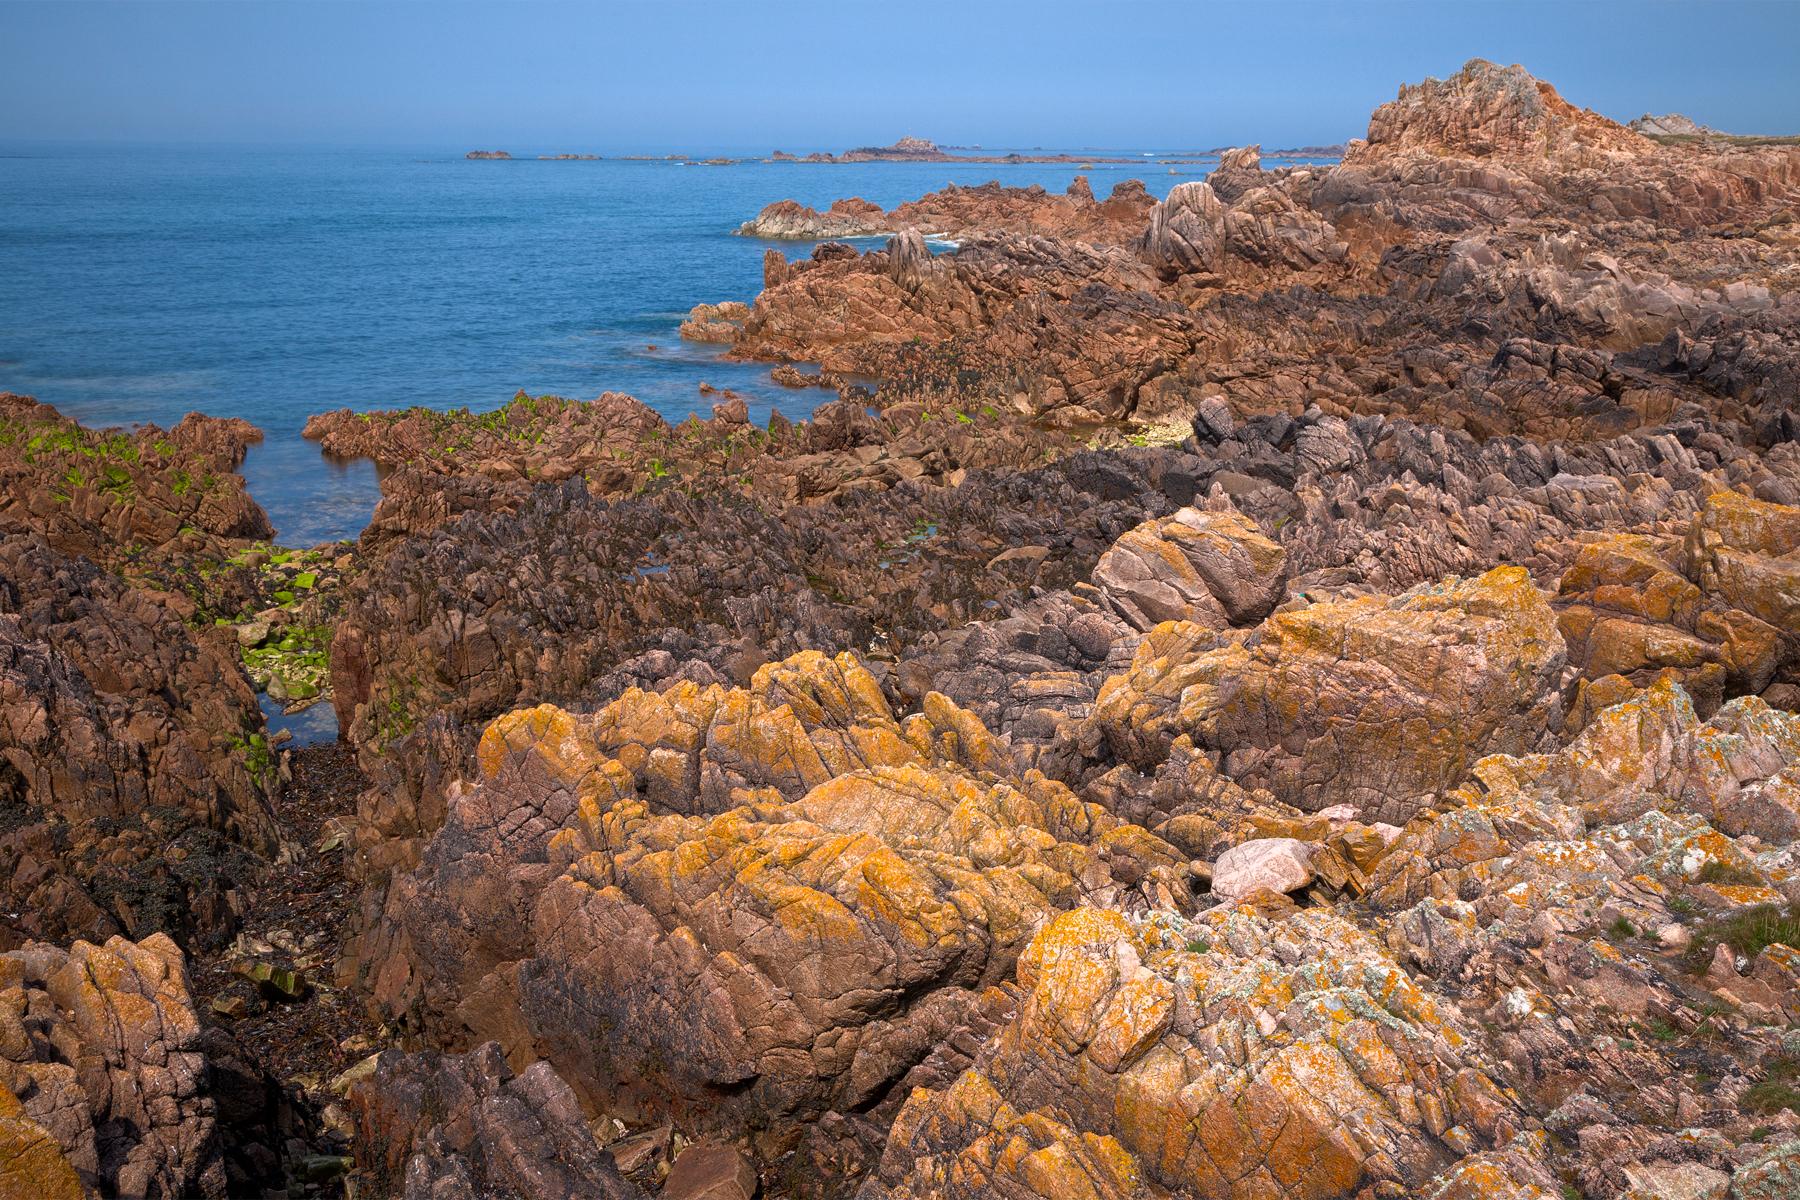 Guernsey cliffs - hdr photo